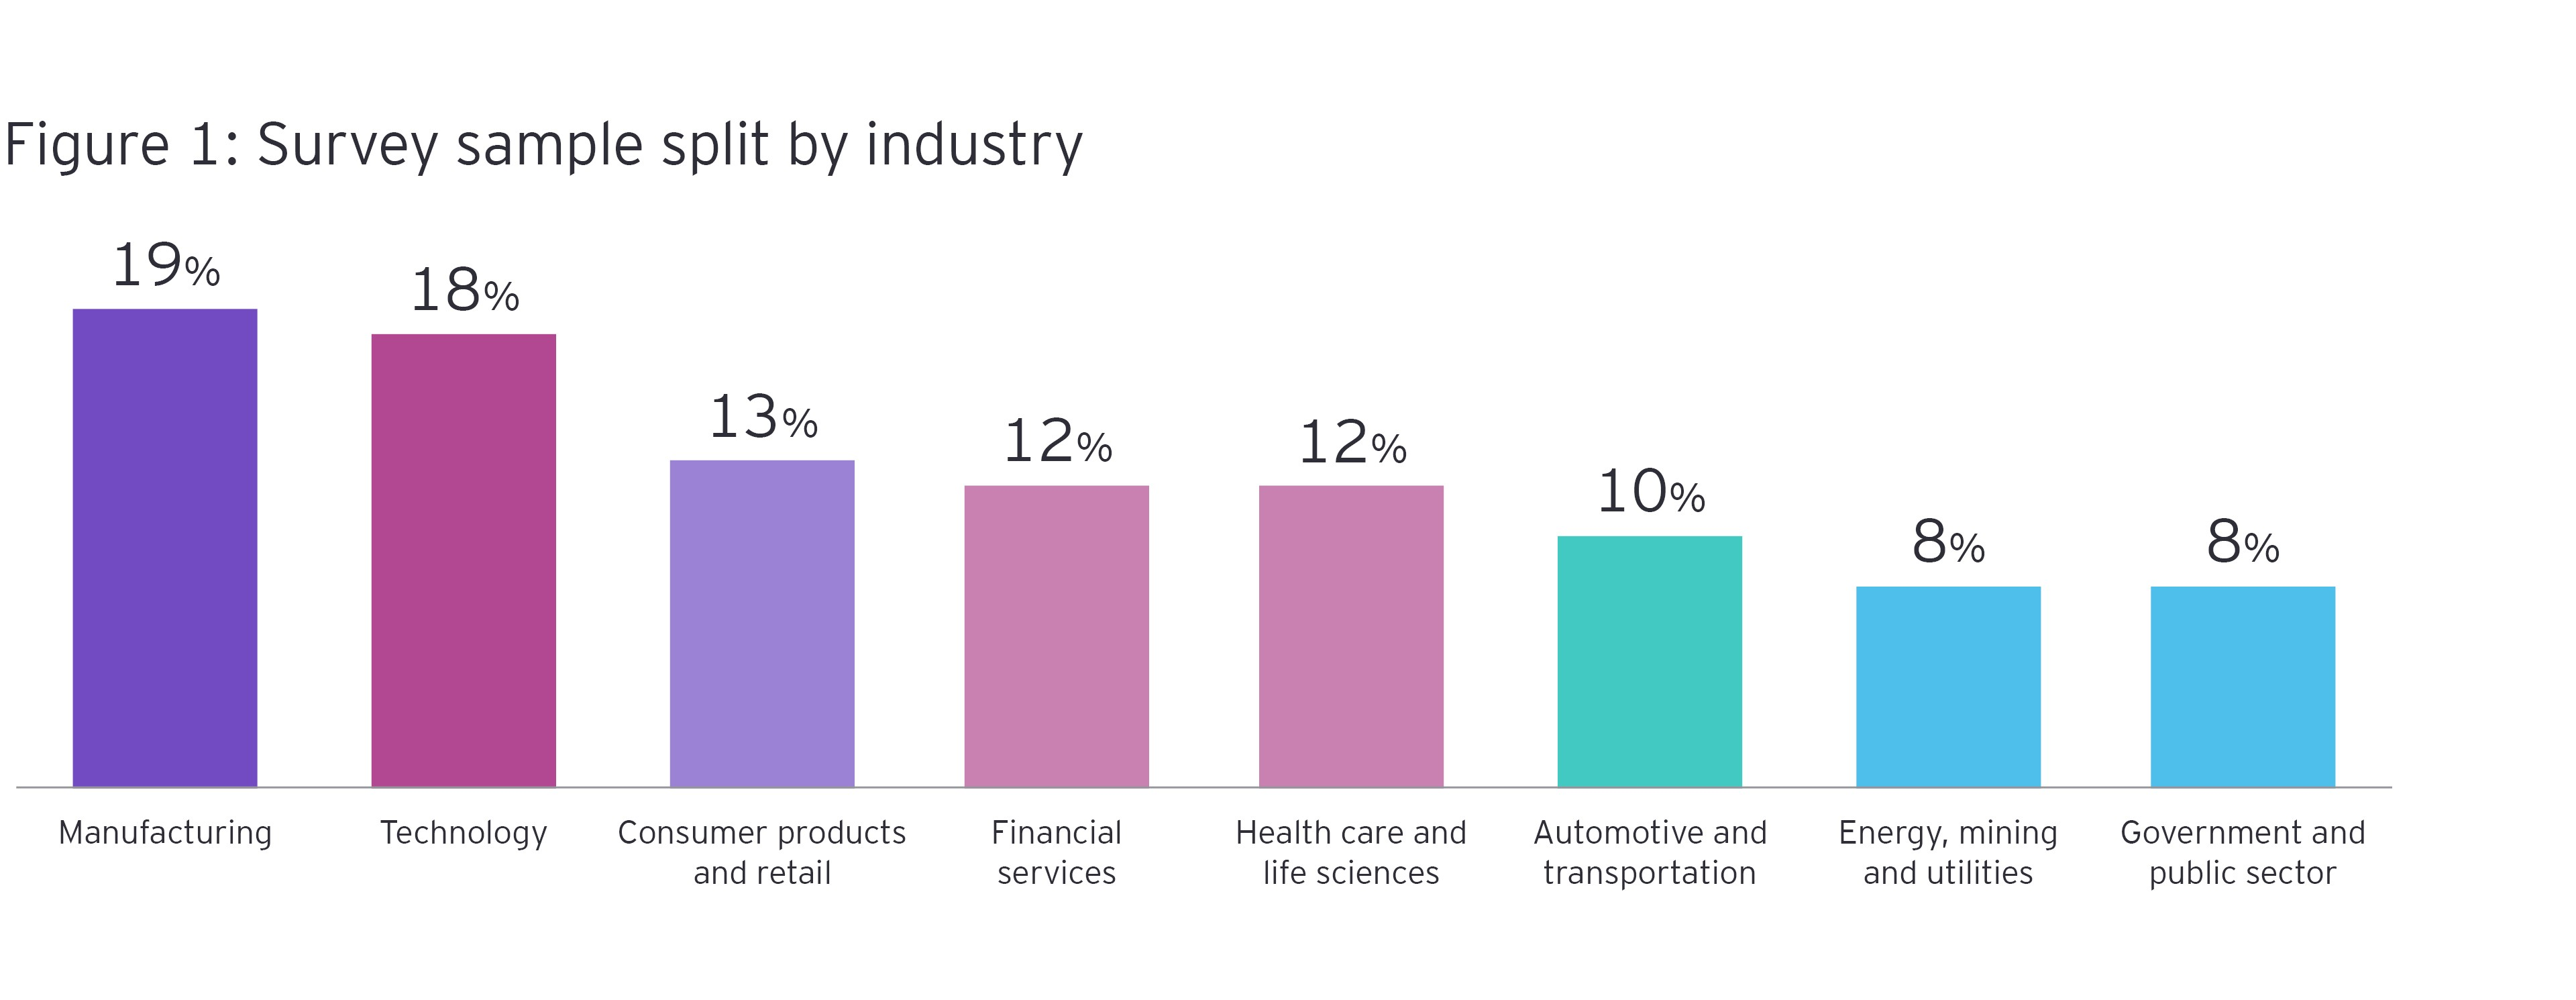 Survey sample split by industry